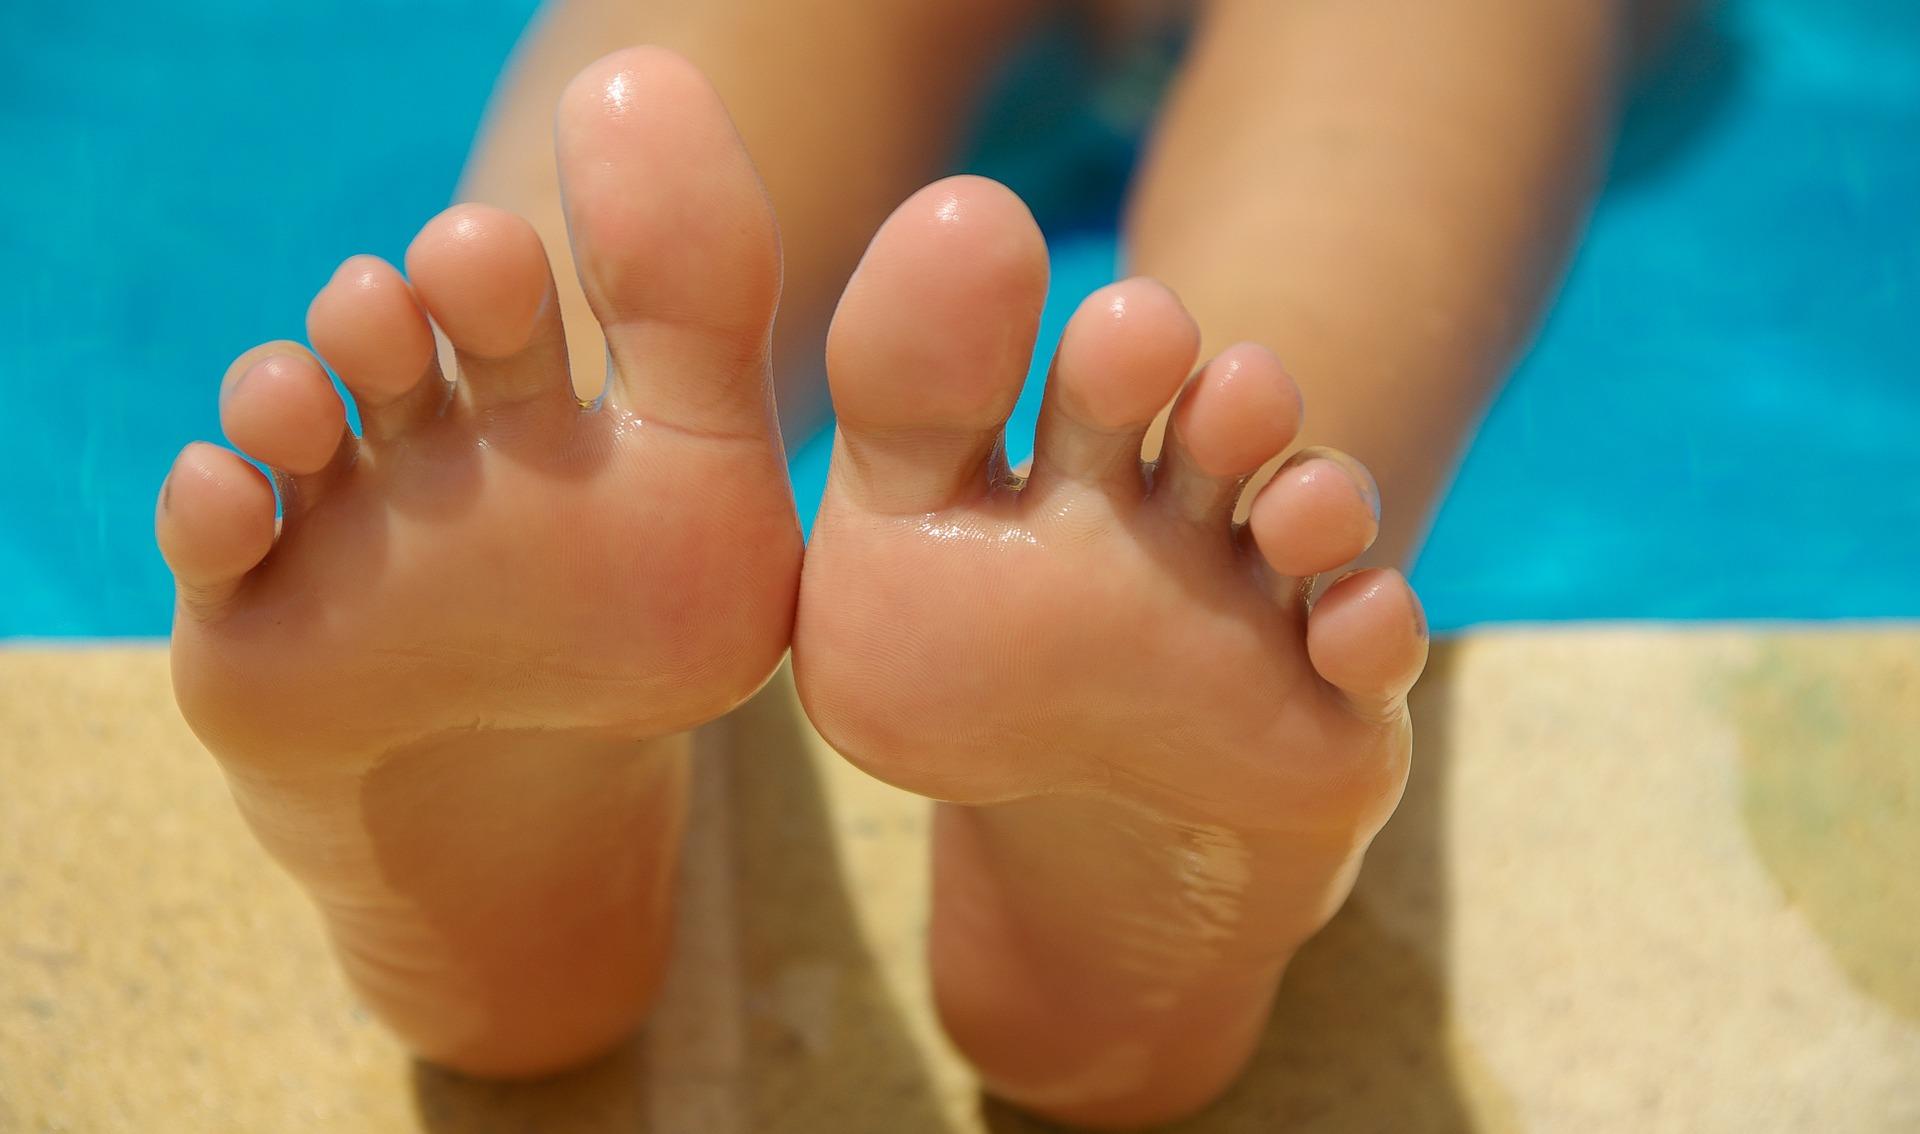 feet-830503_1920